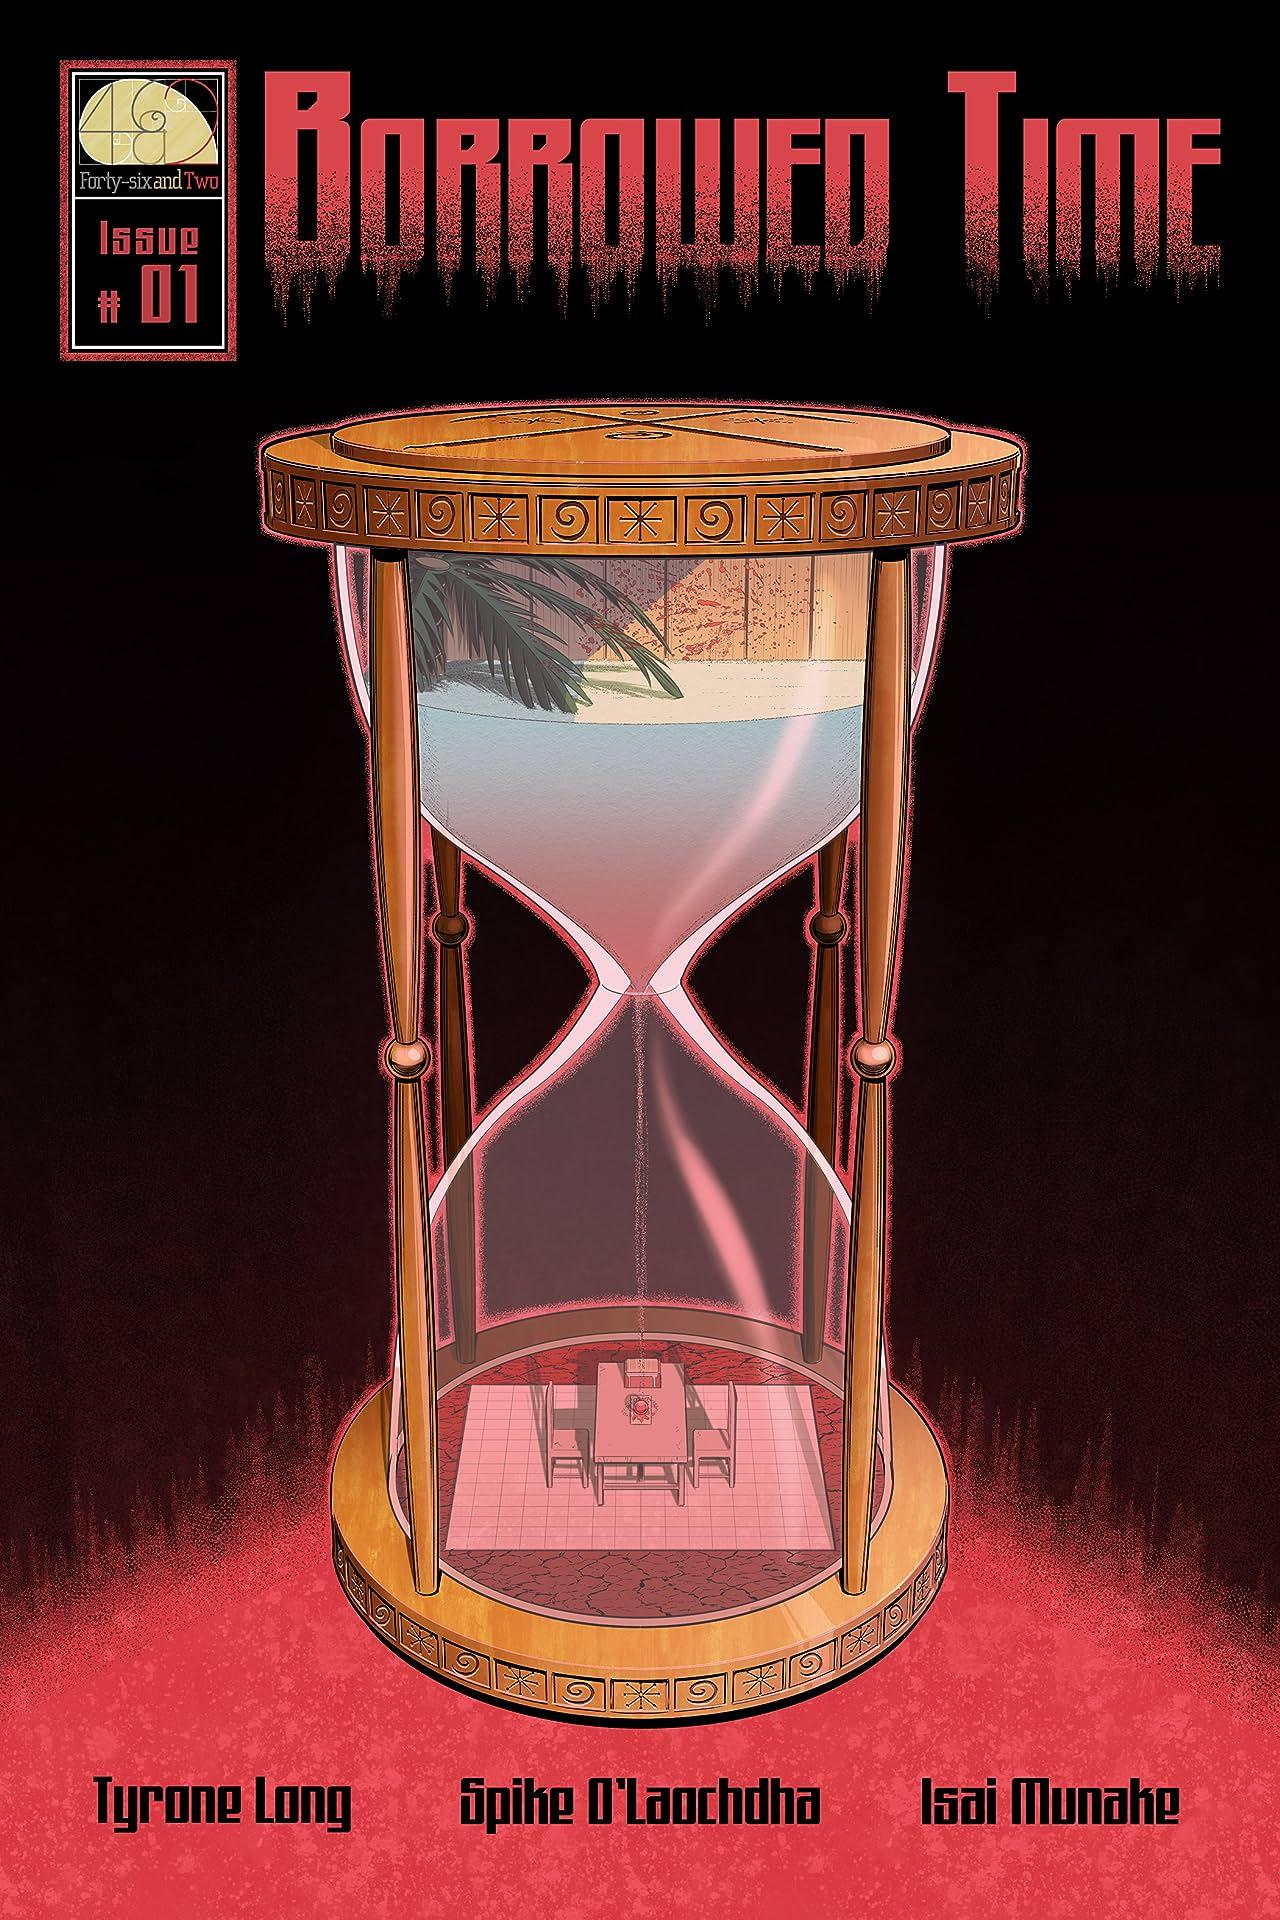 Borrowed Time #01